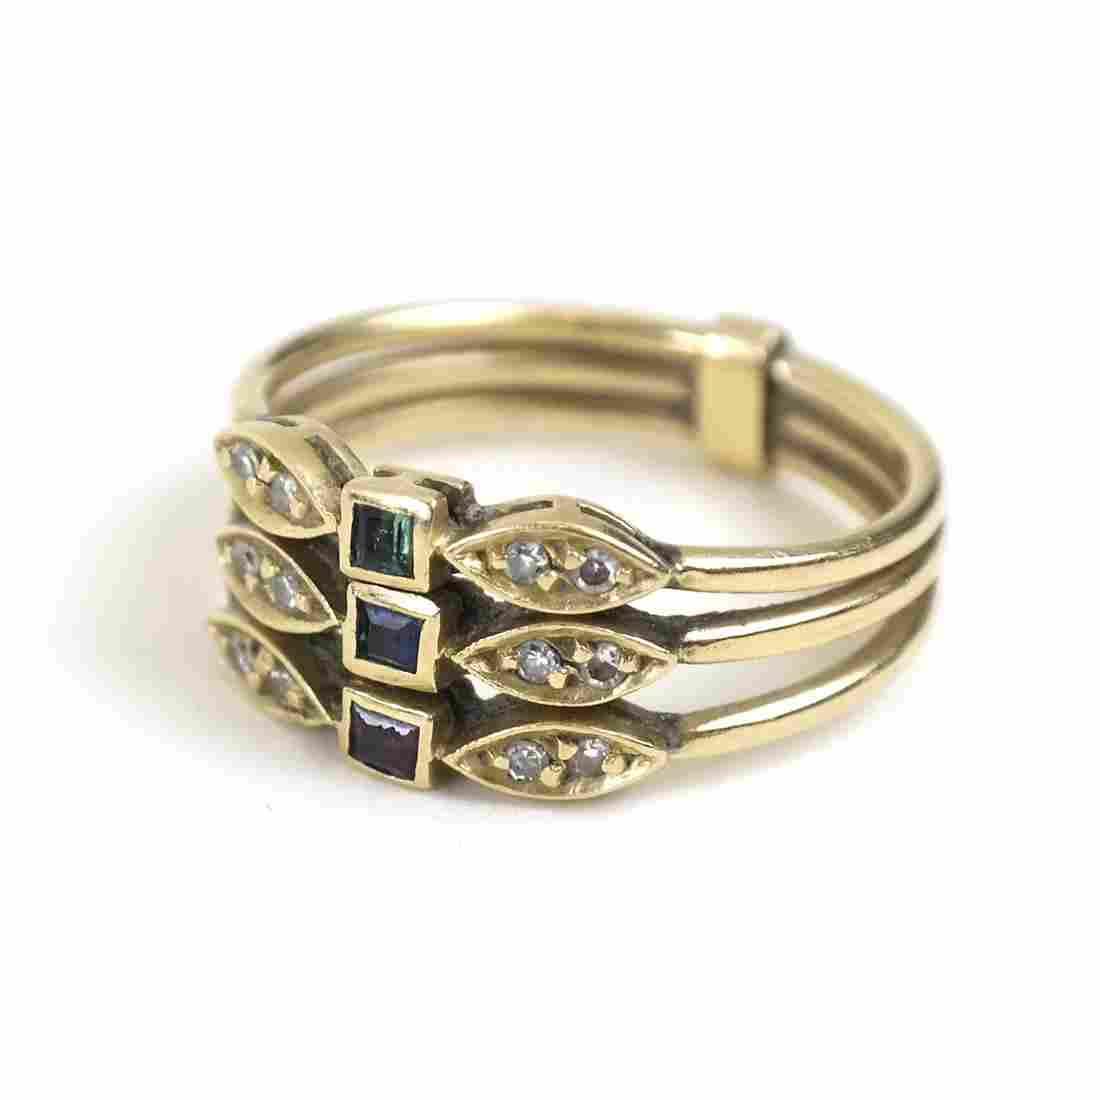 18K Yellow Gold, Diamond and Jeweled Ring